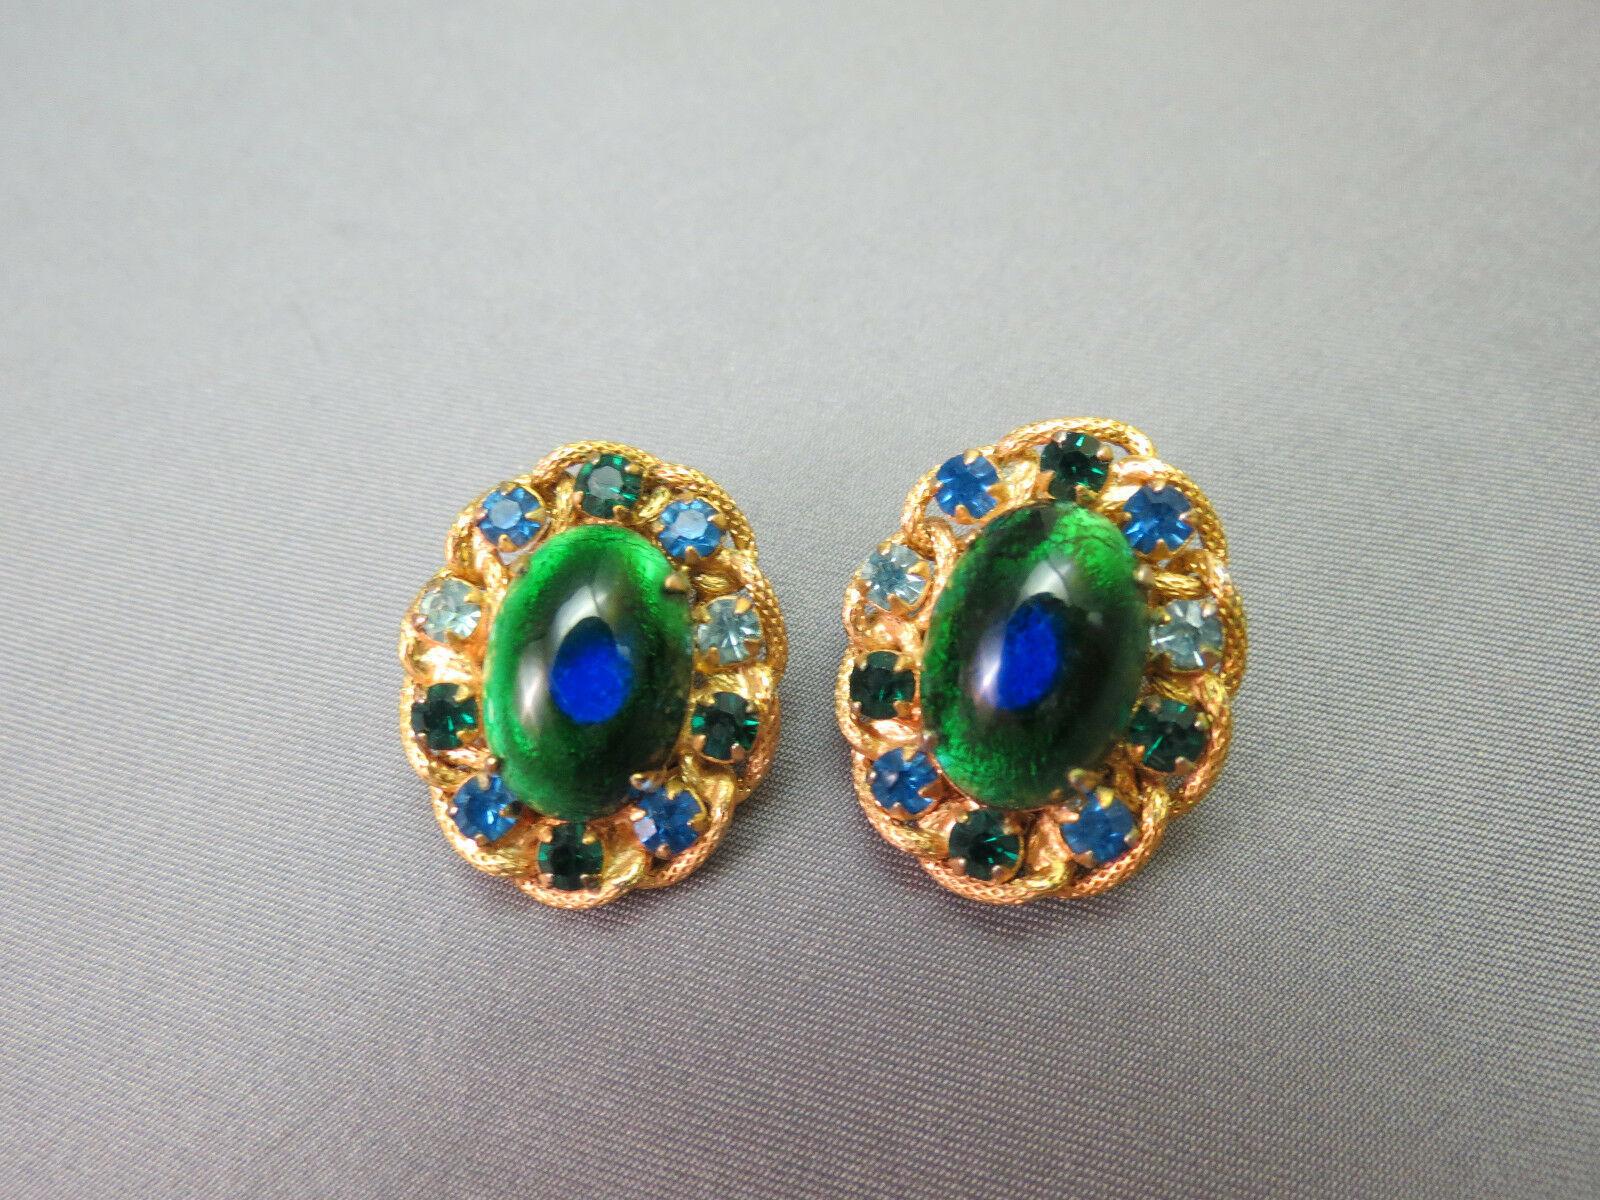 VTG Brania Bib Necklace Mimi Di N Collar Parue Blue Rhinestones Peacock Eye Cabs image 3